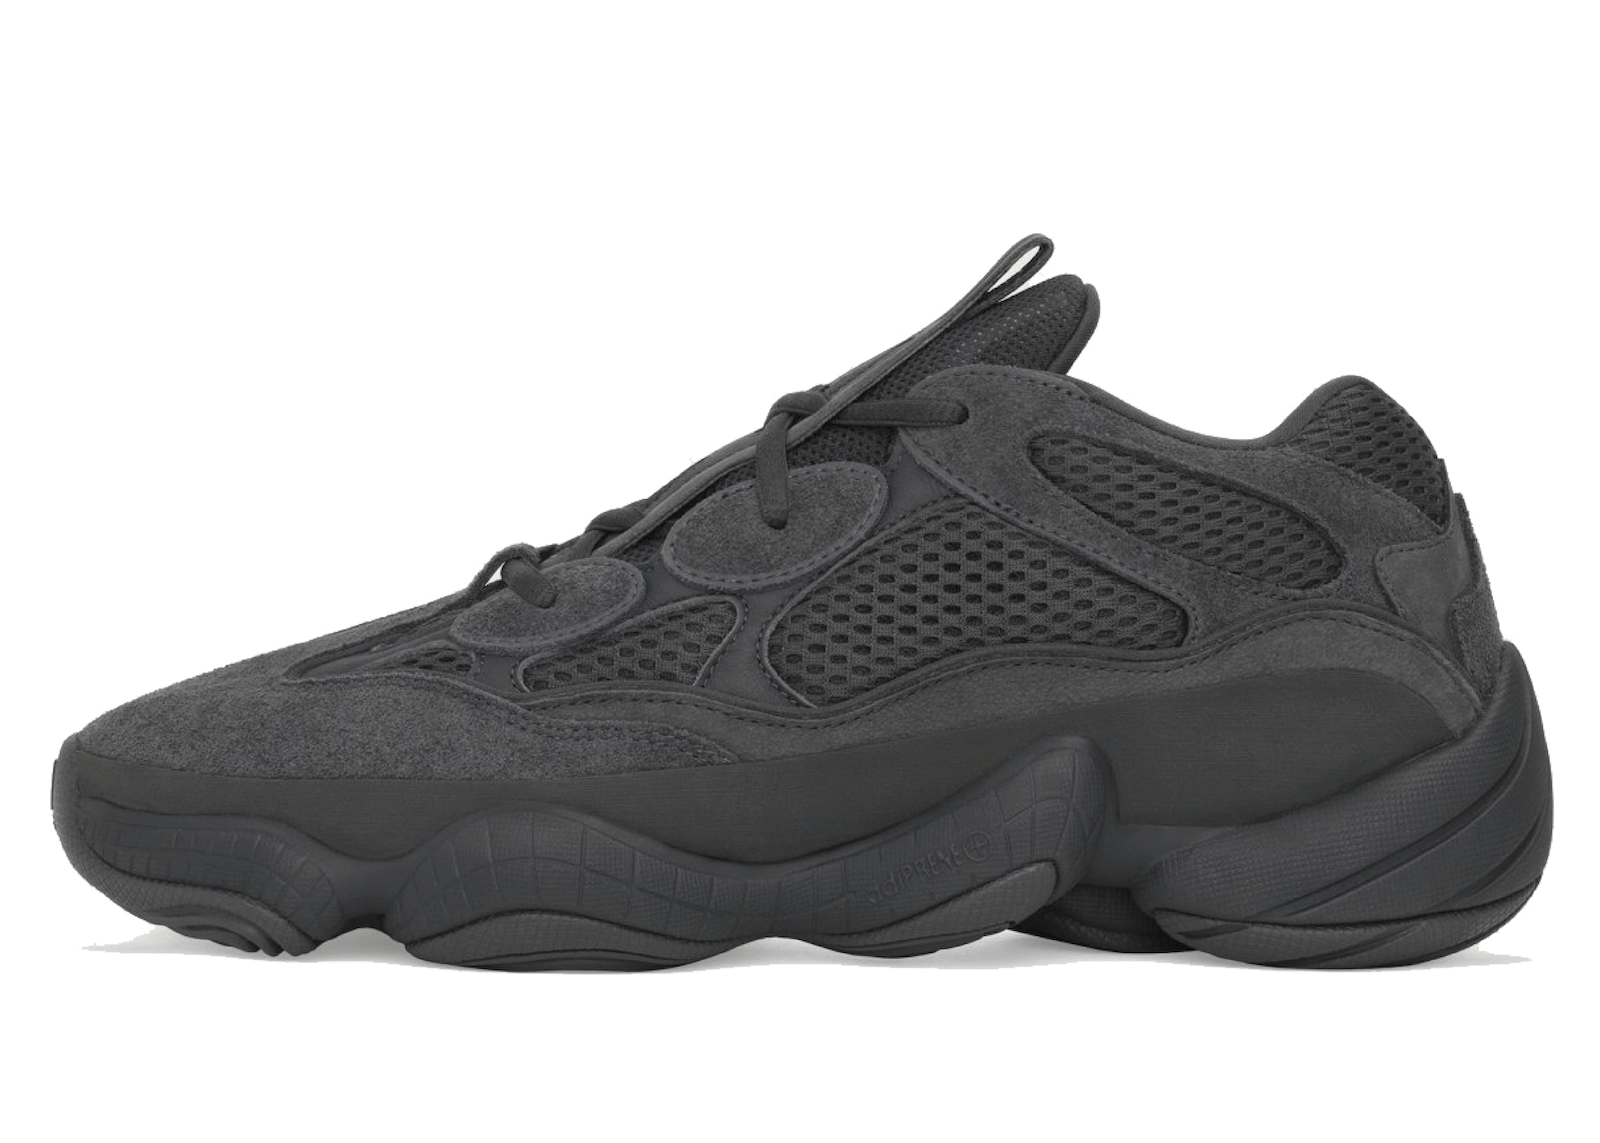 "Adidas Yeezy 500 ""Utility Black""の写真"